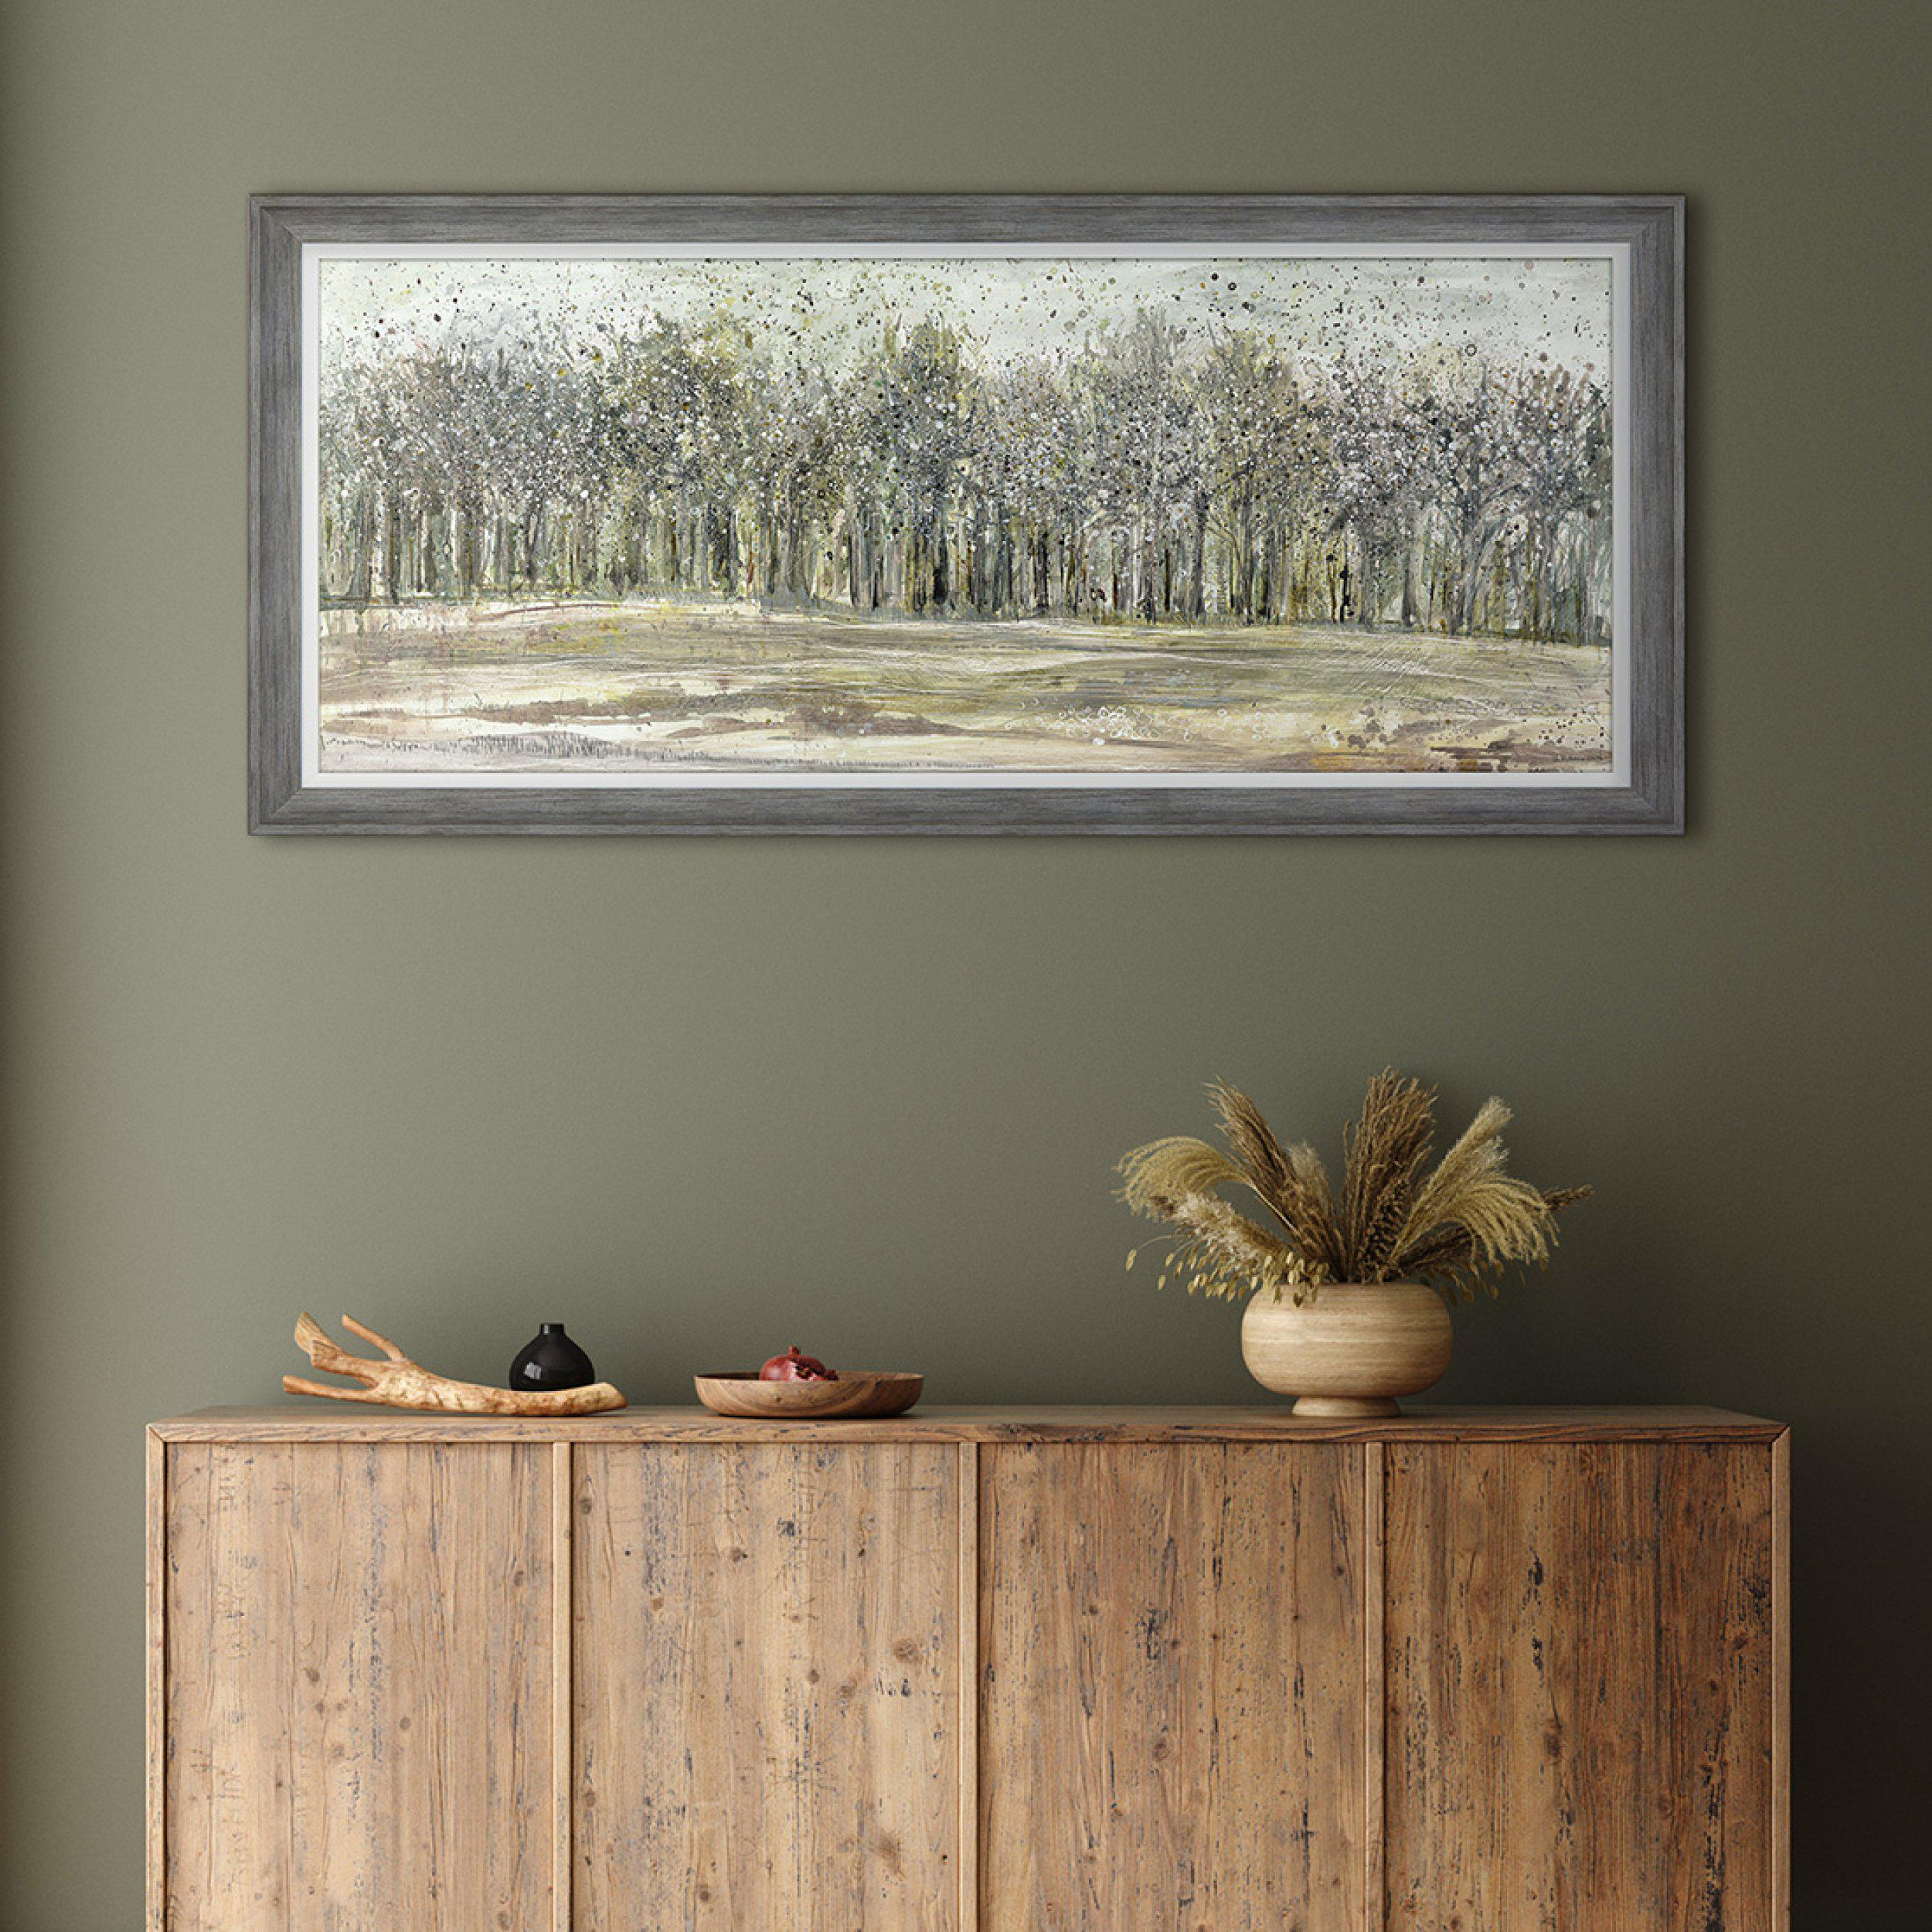 Shadow Grey Woodlands - Trees Painting - Artist Ulyana Hammond - Framed Print For Sale - Room Display